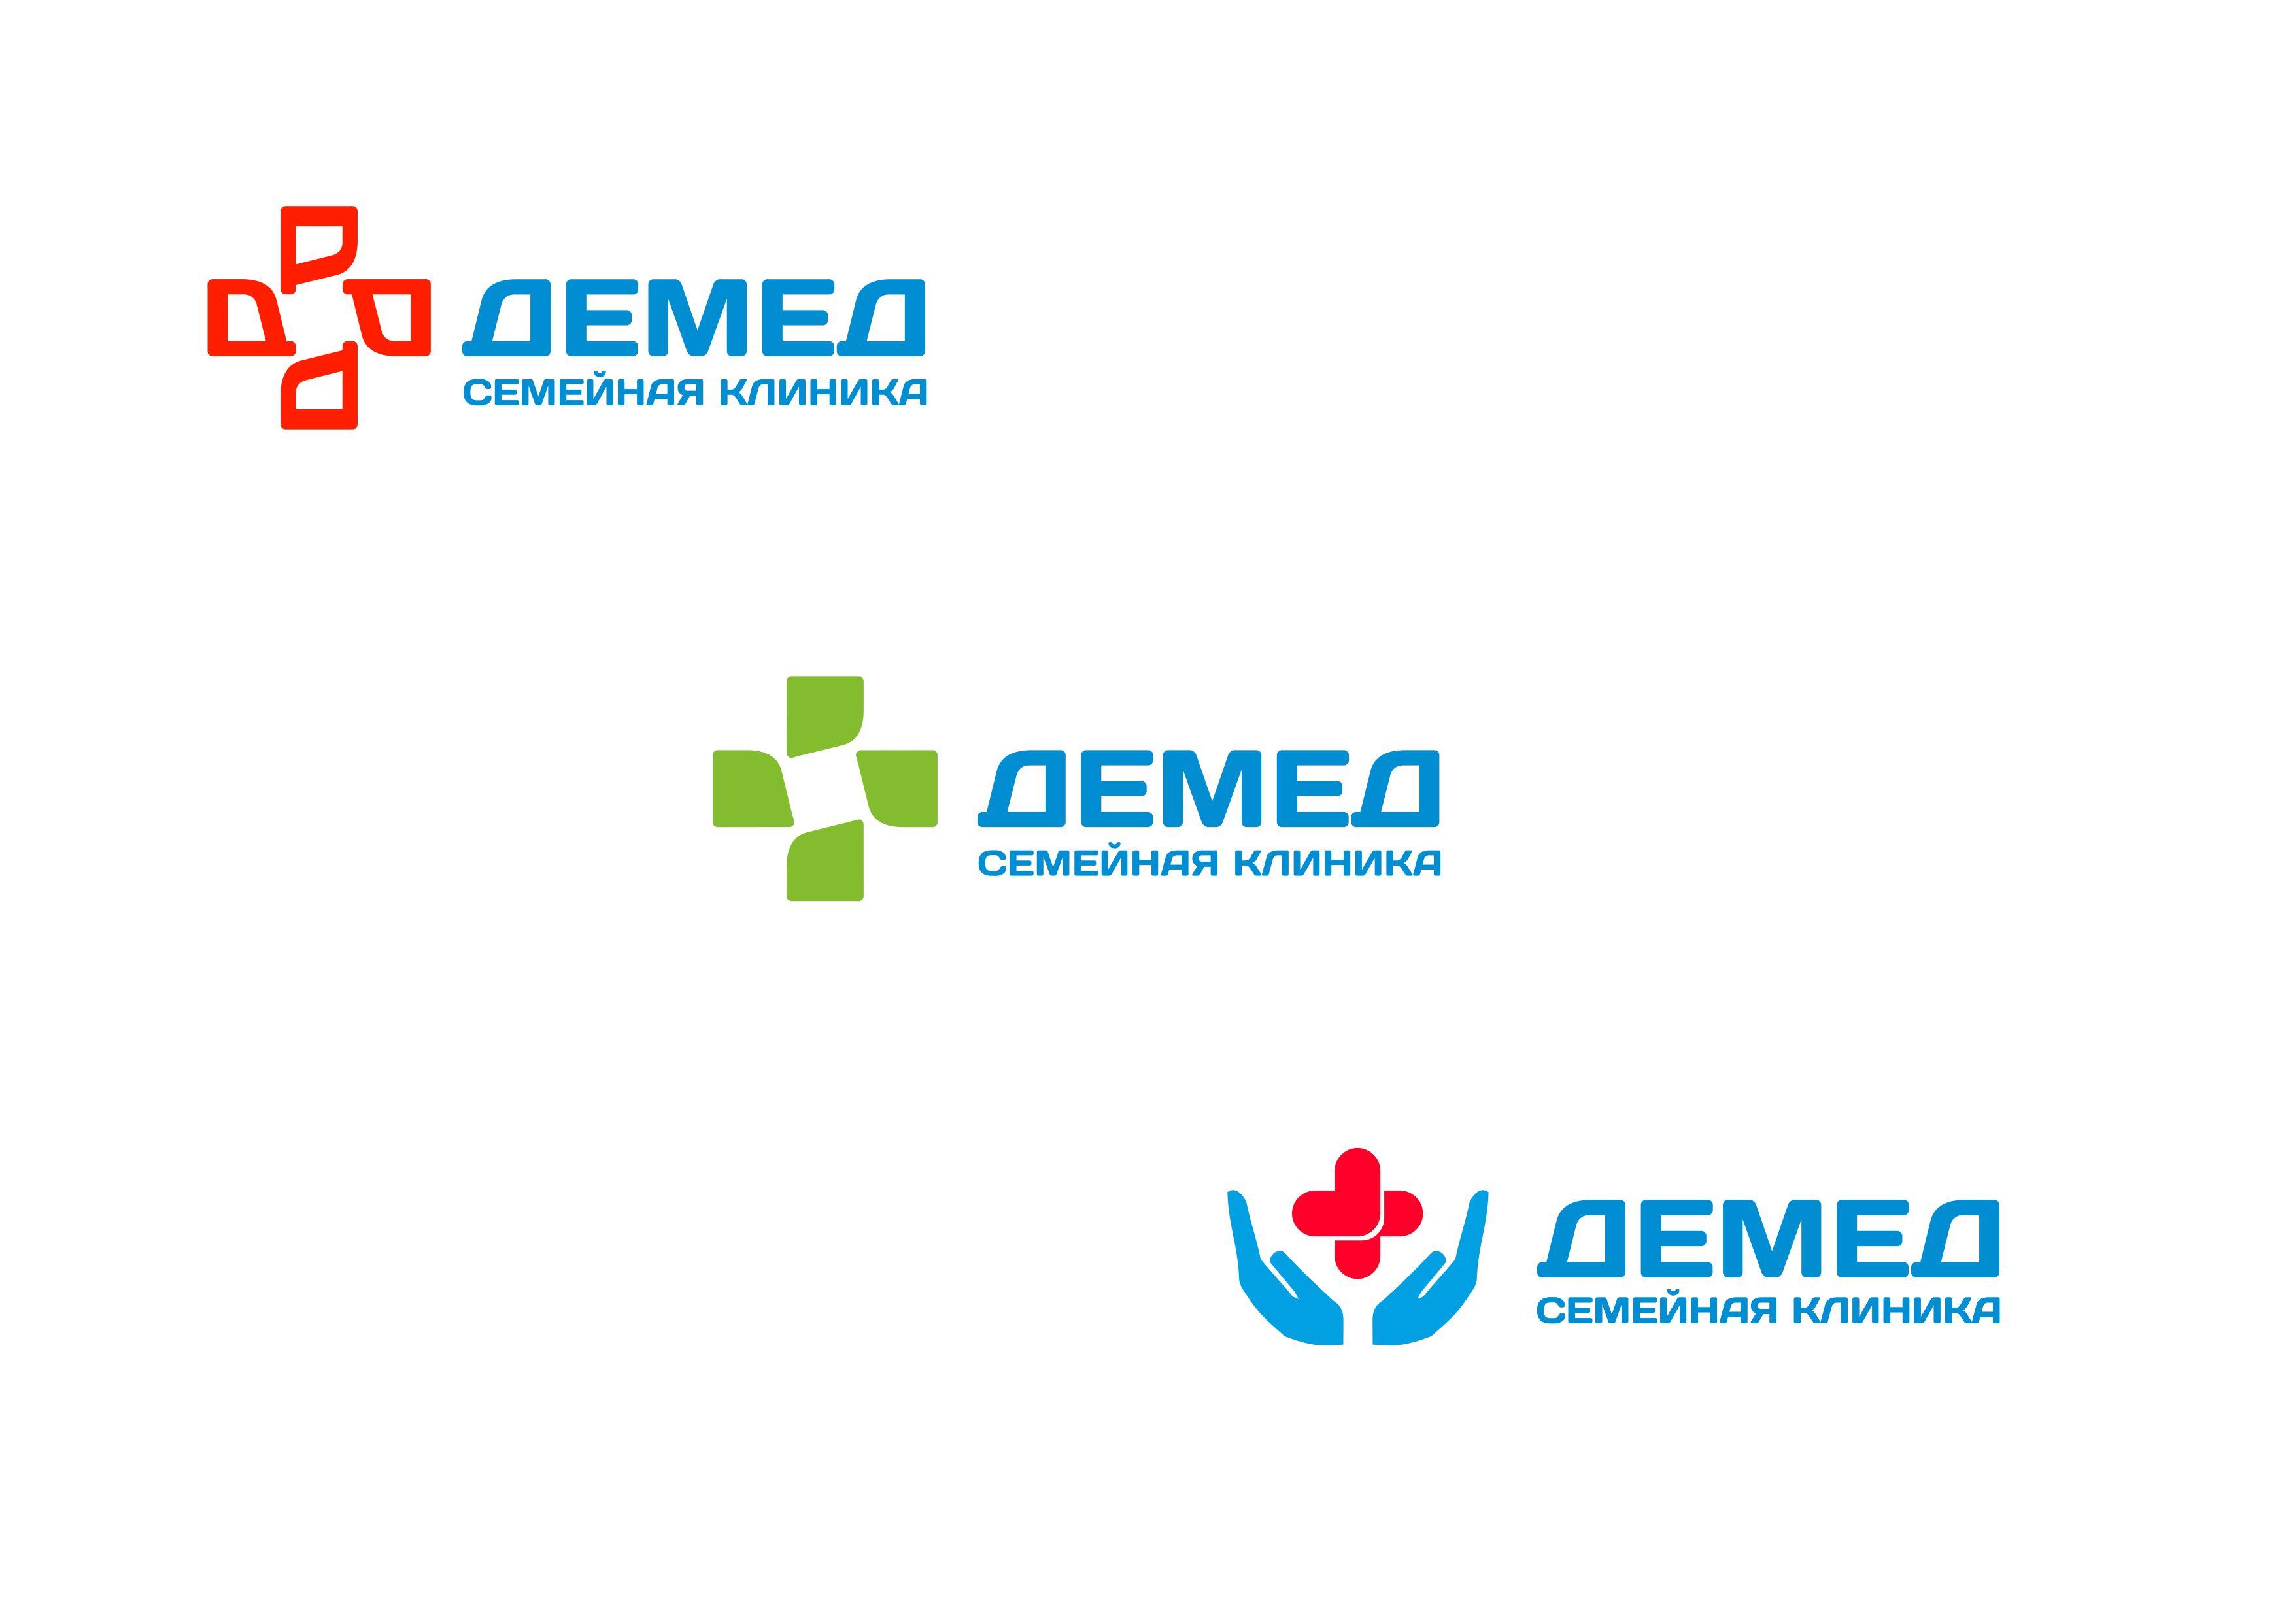 Логотип медицинского центра фото f_9815dcf0eada08f5.jpg